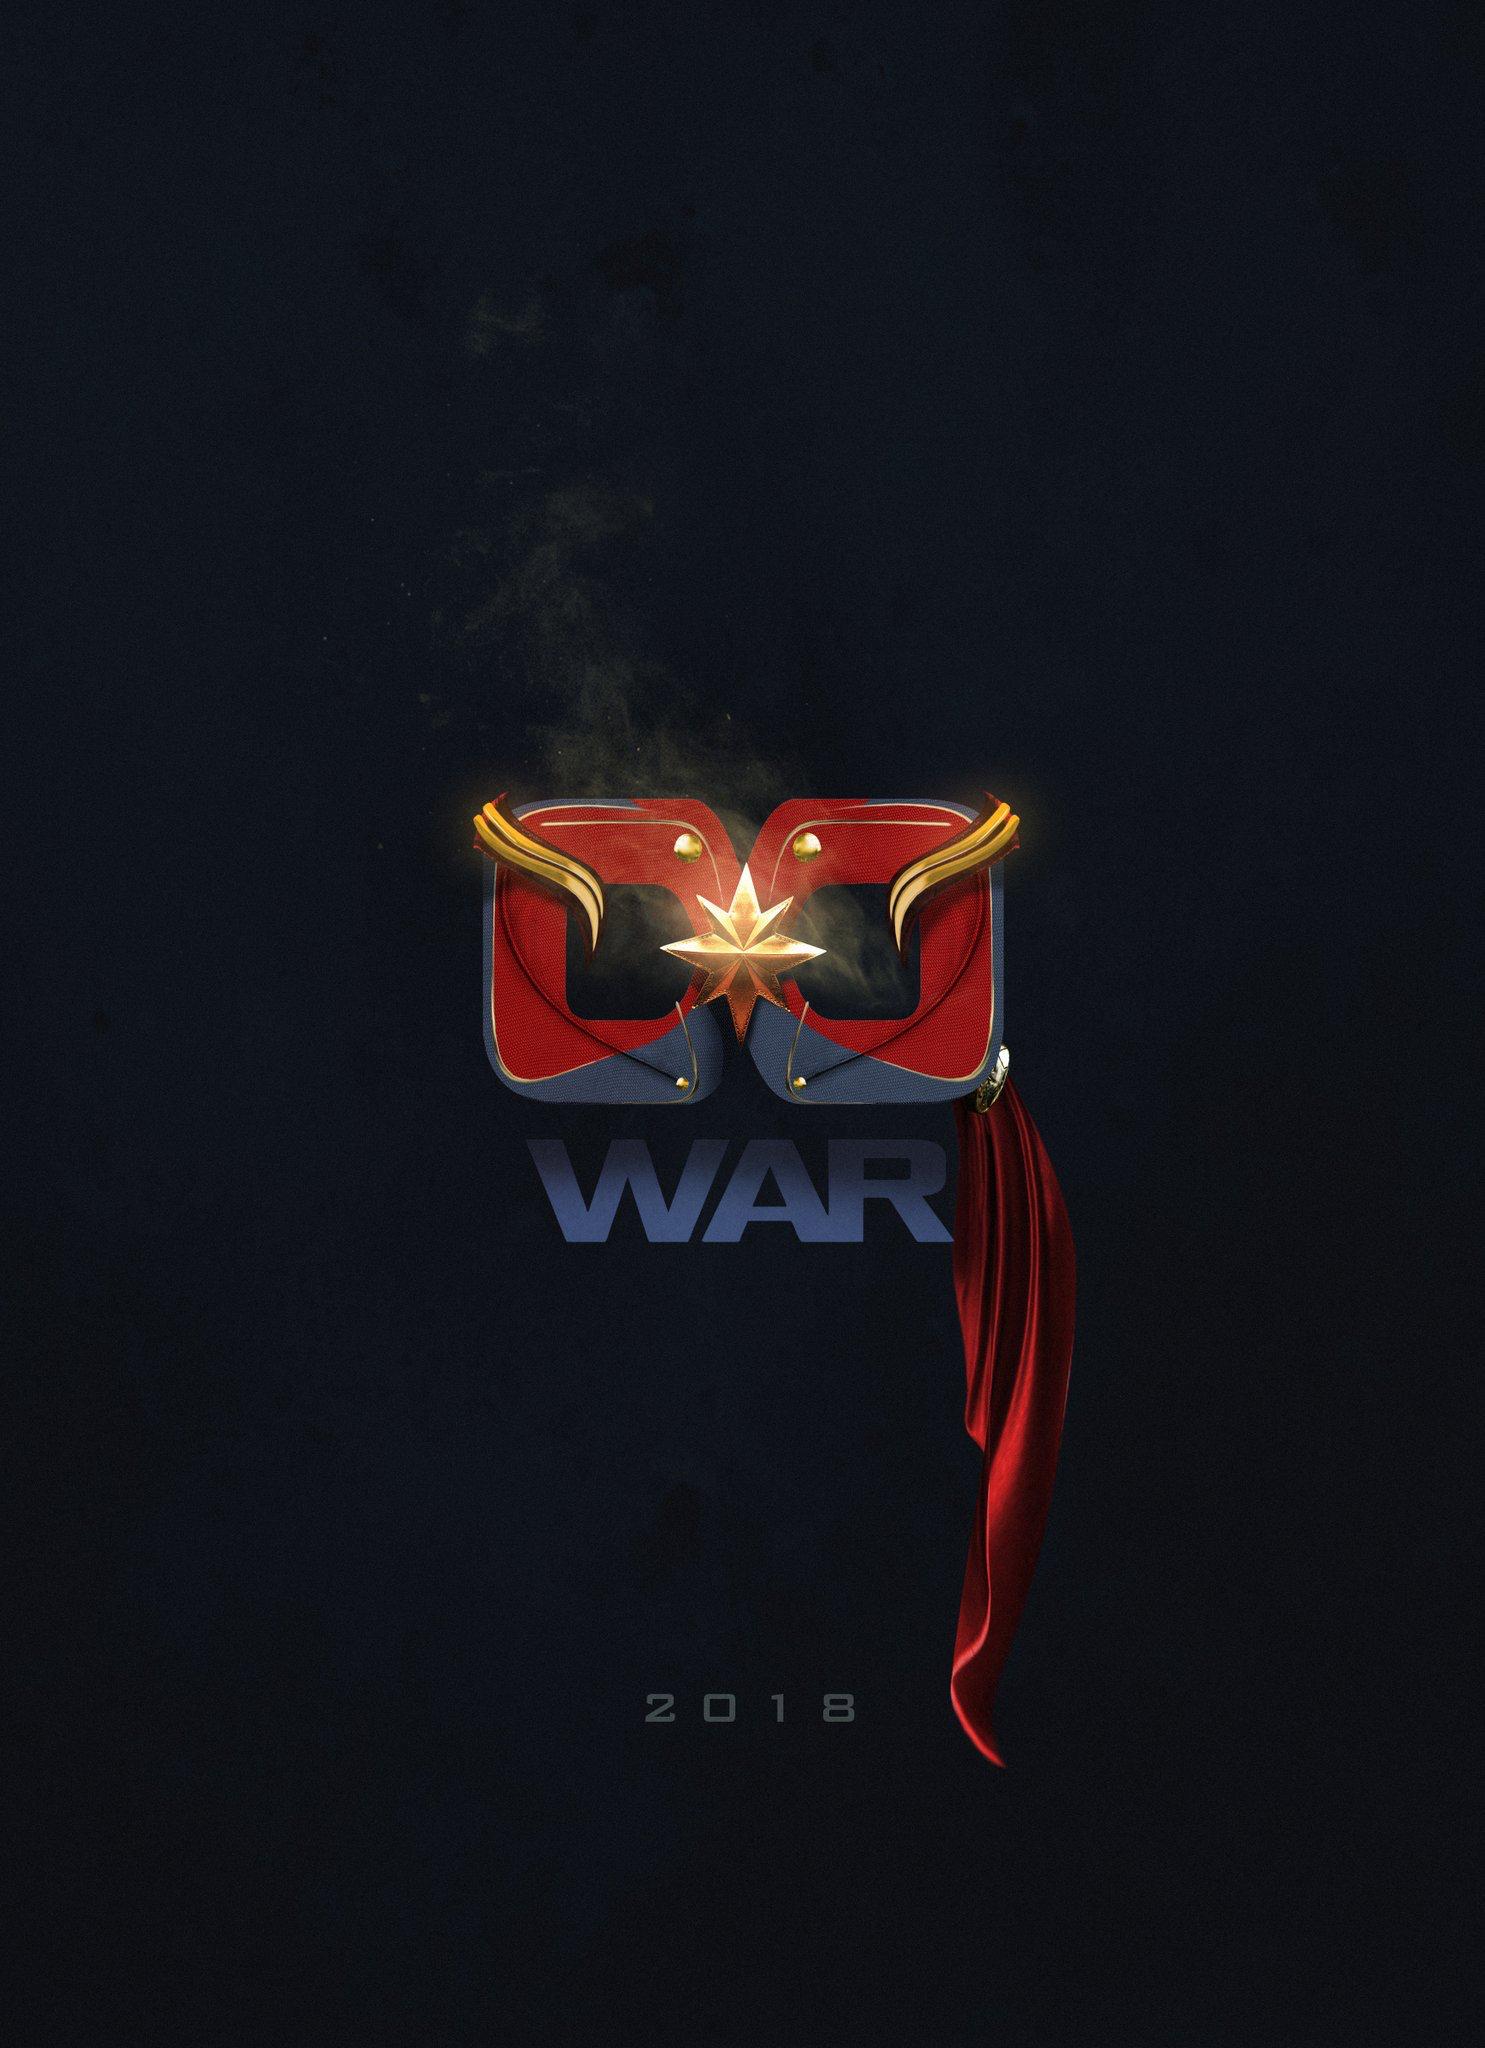 Avengers Infinity War Infinity War Marvel Infinity War Avengers